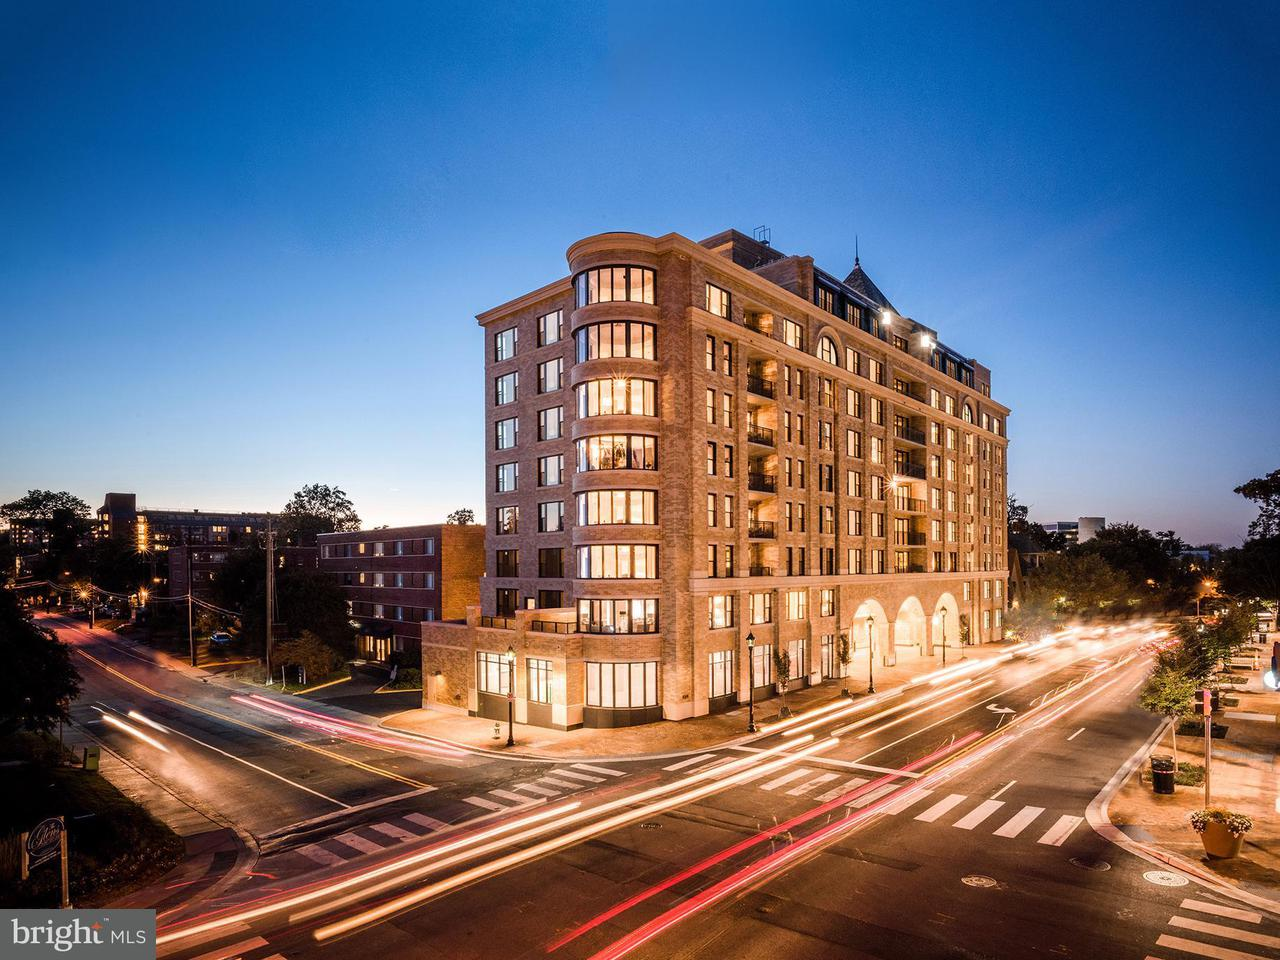 Condominium for Sale at 8302 Woodmont Ave #702 8302 Woodmont Ave #702 Bethesda, Maryland 20814 United States